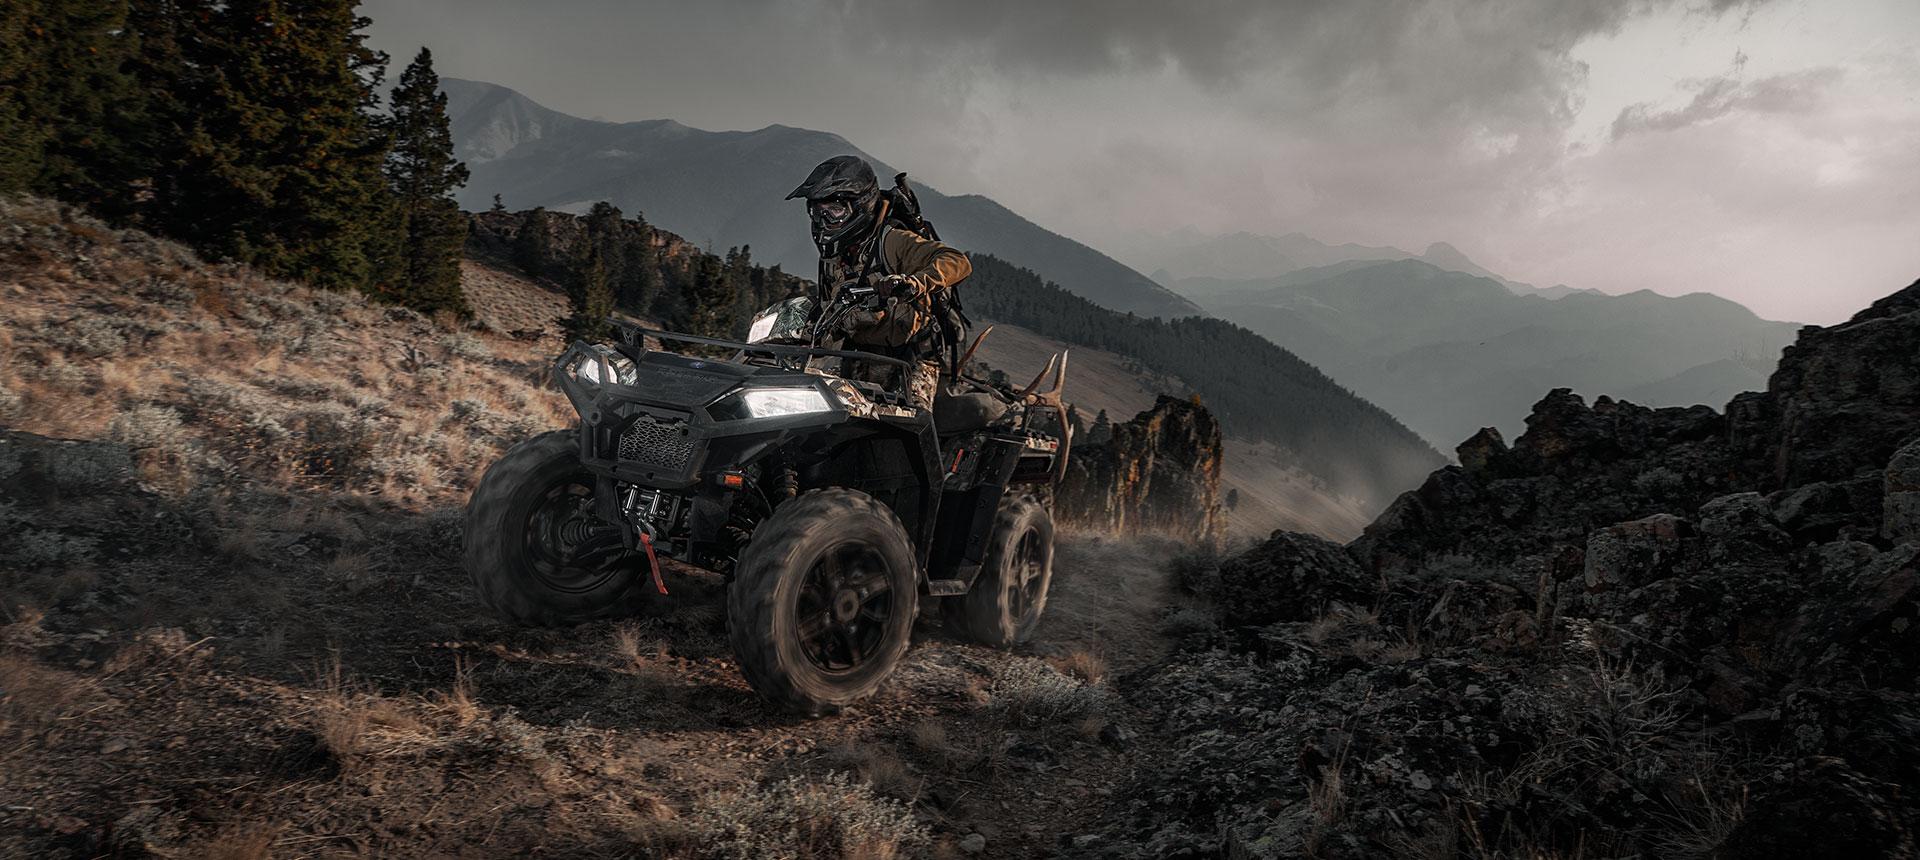 Polaris ATV going up a trail